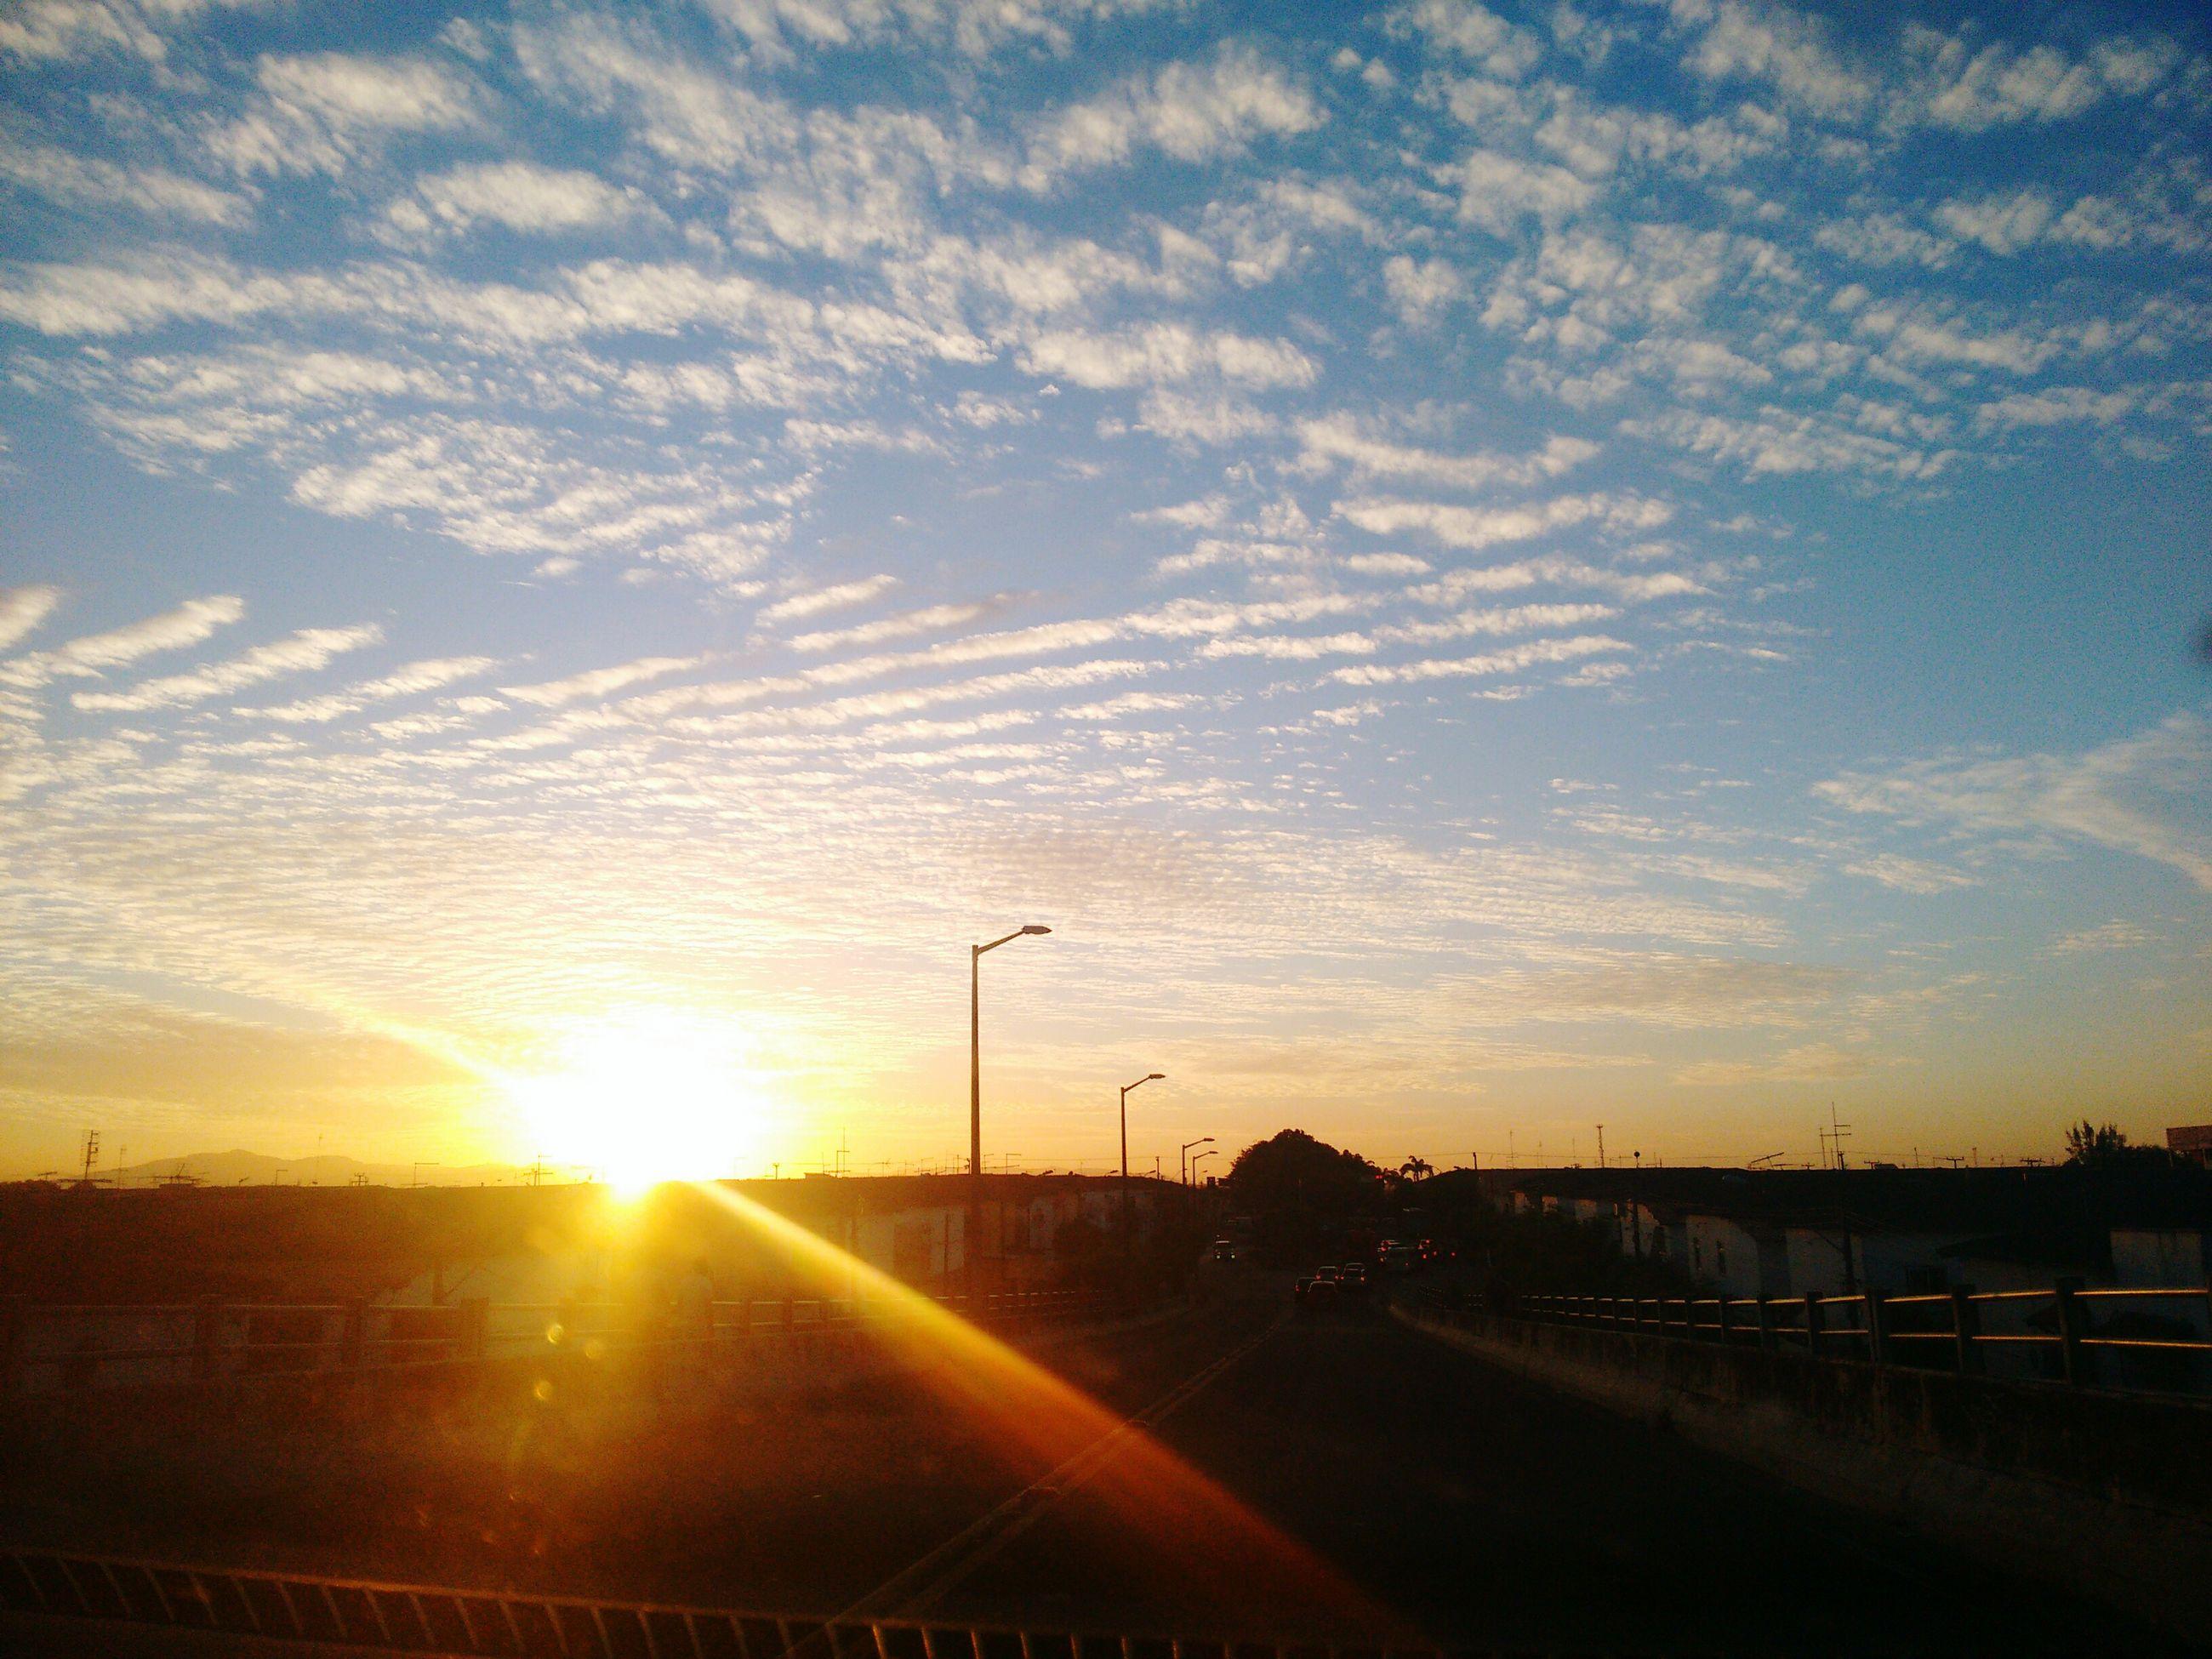 sunset, sun, sky, road, transportation, cloud - sky, no people, street light, silhouette, sunlight, car, scenics, nature, outdoors, beauty in nature, day